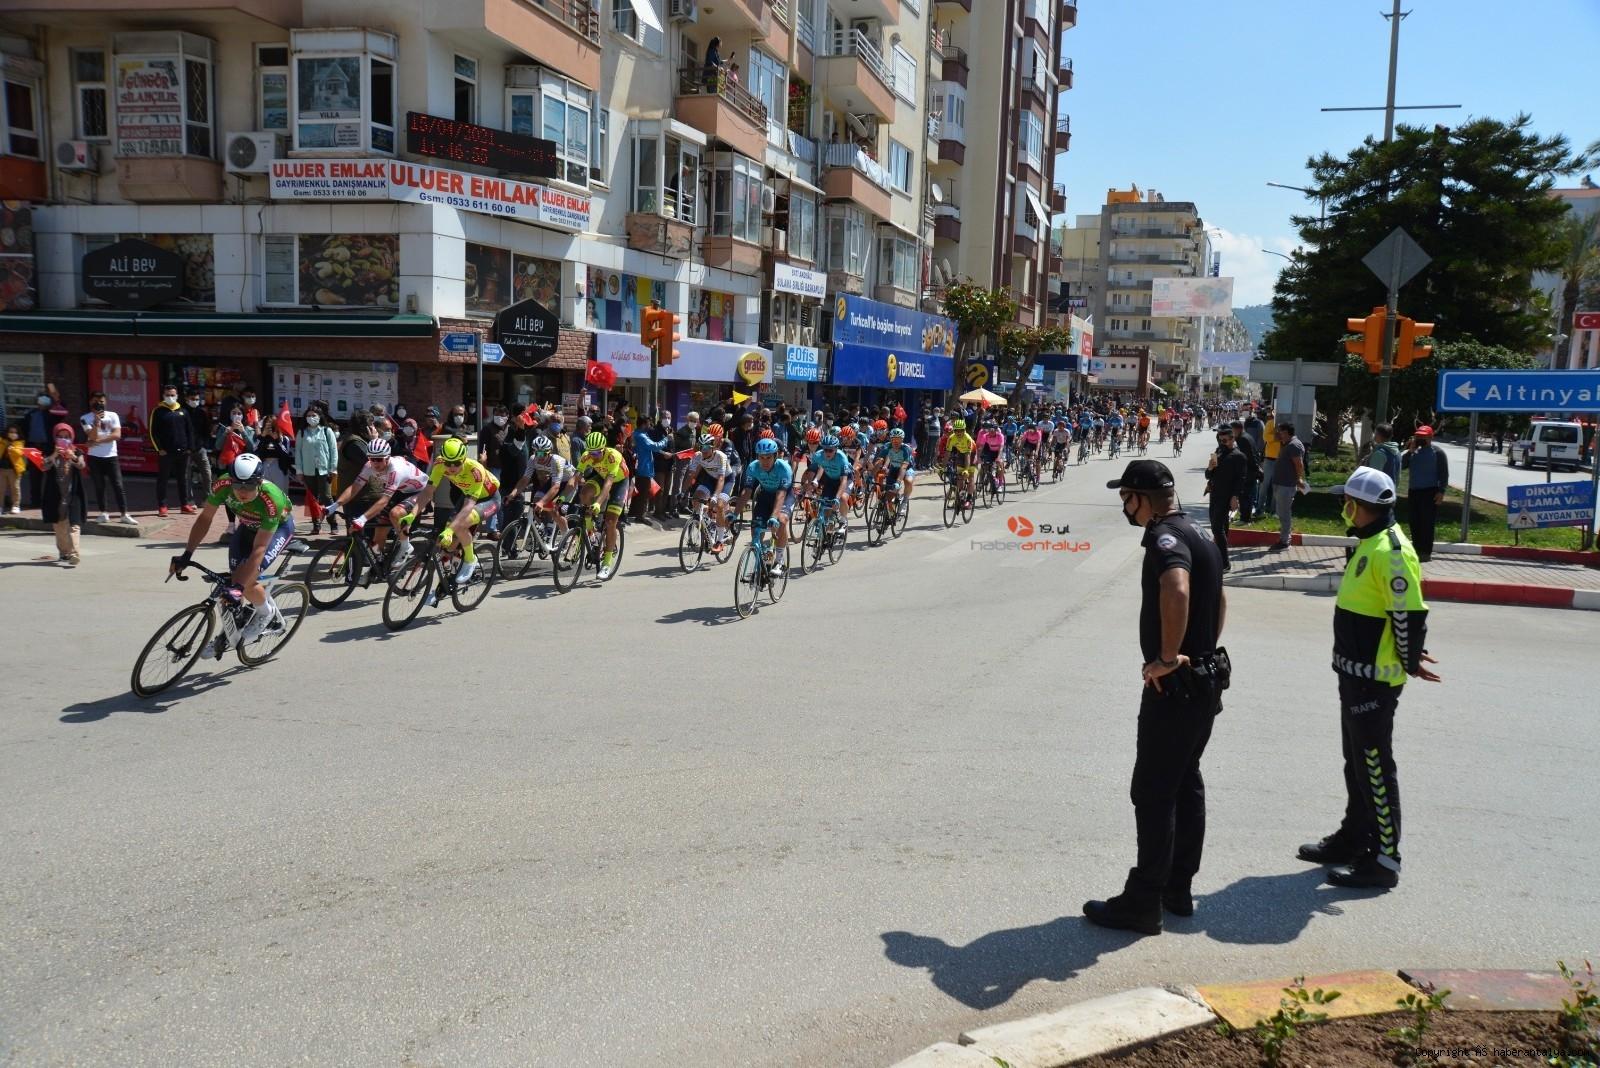 2021/04/56-cumhurbaskanligi-turkiye-bisiklet-turunda-kaza-ucuz-atlatildi-20210415AW29-3.jpg